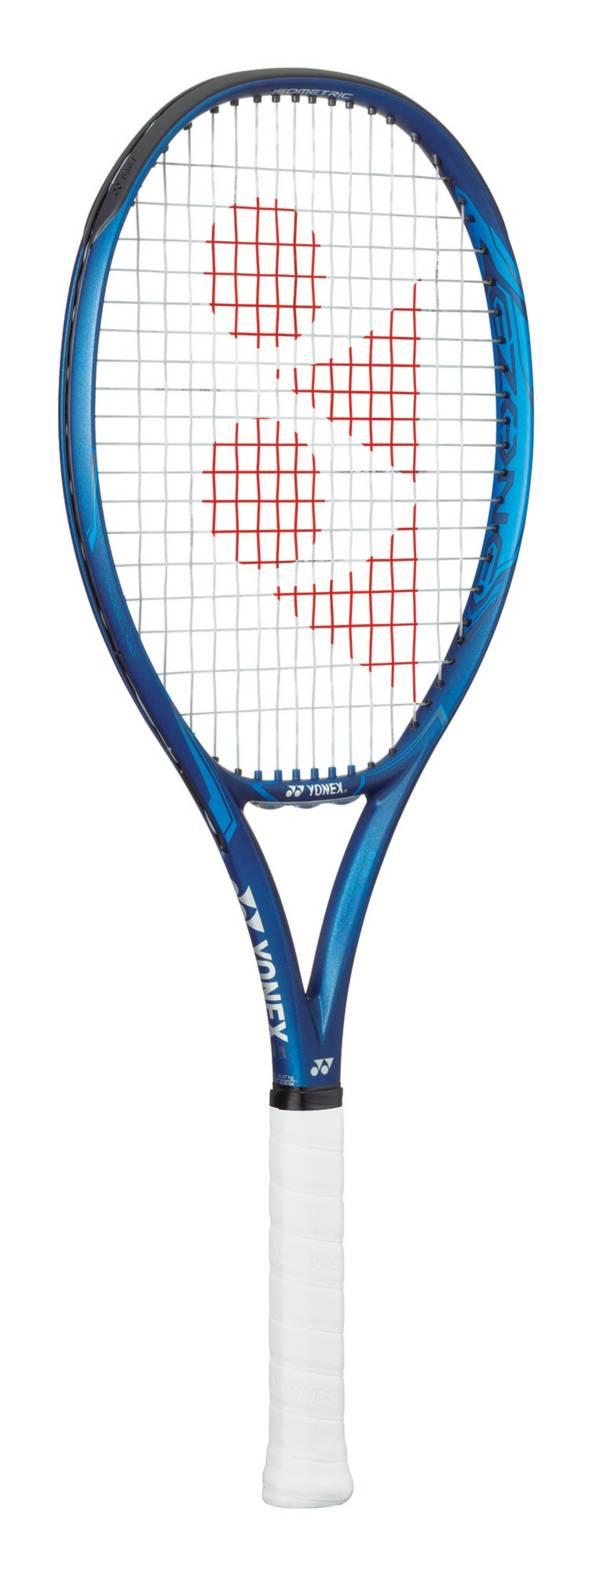 Yonex Ezone Feel Tennis Racquet product image